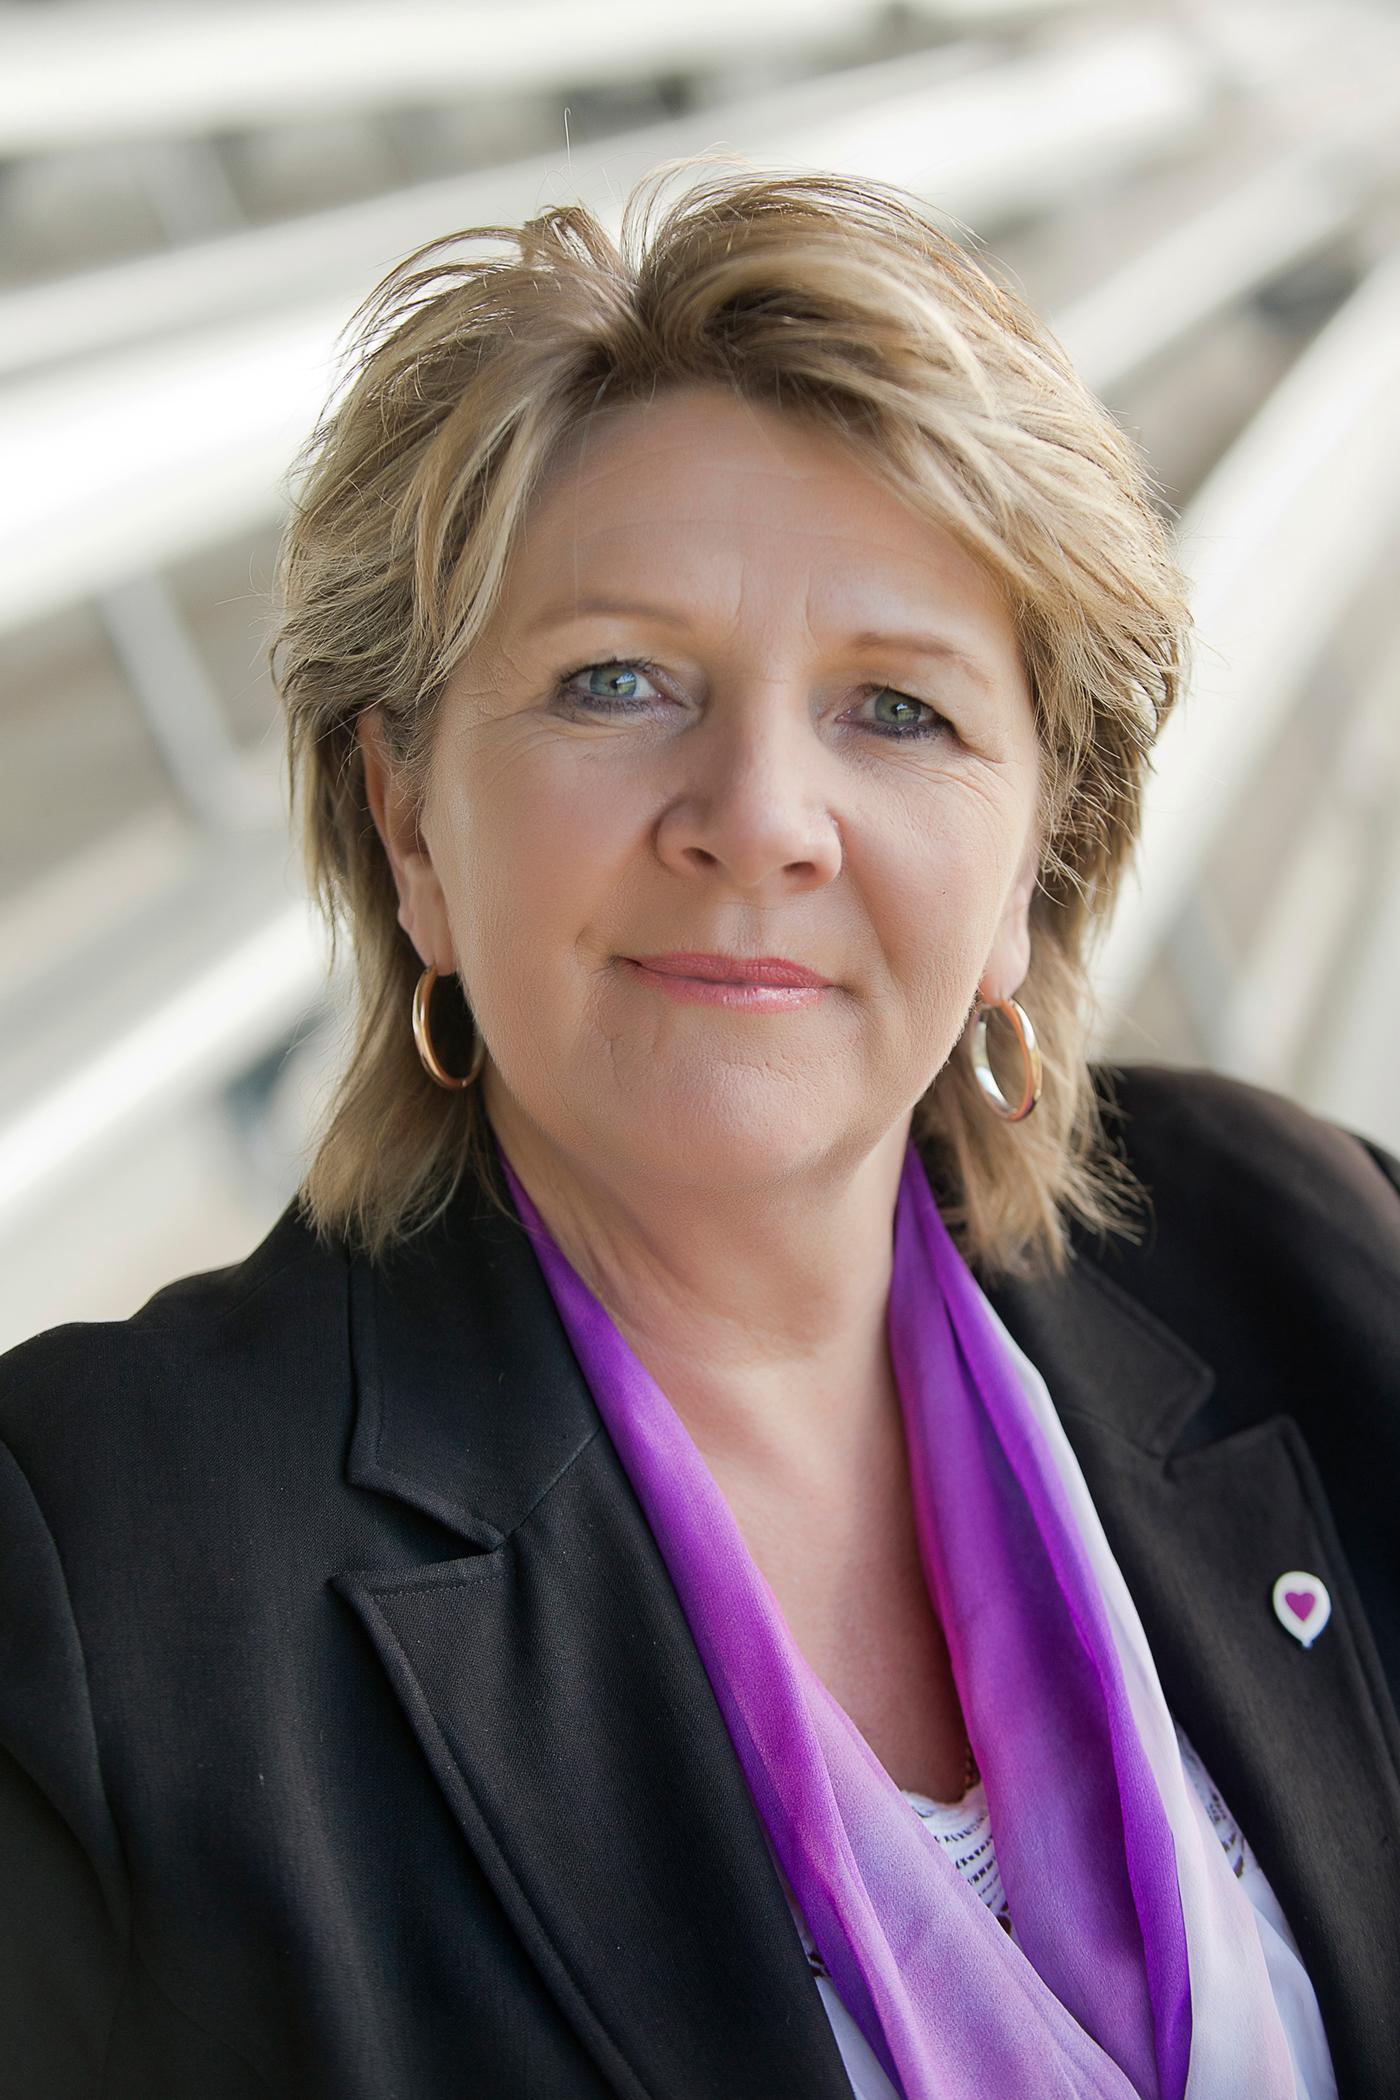 Hetty Johnston Main Profile Picture.jpg